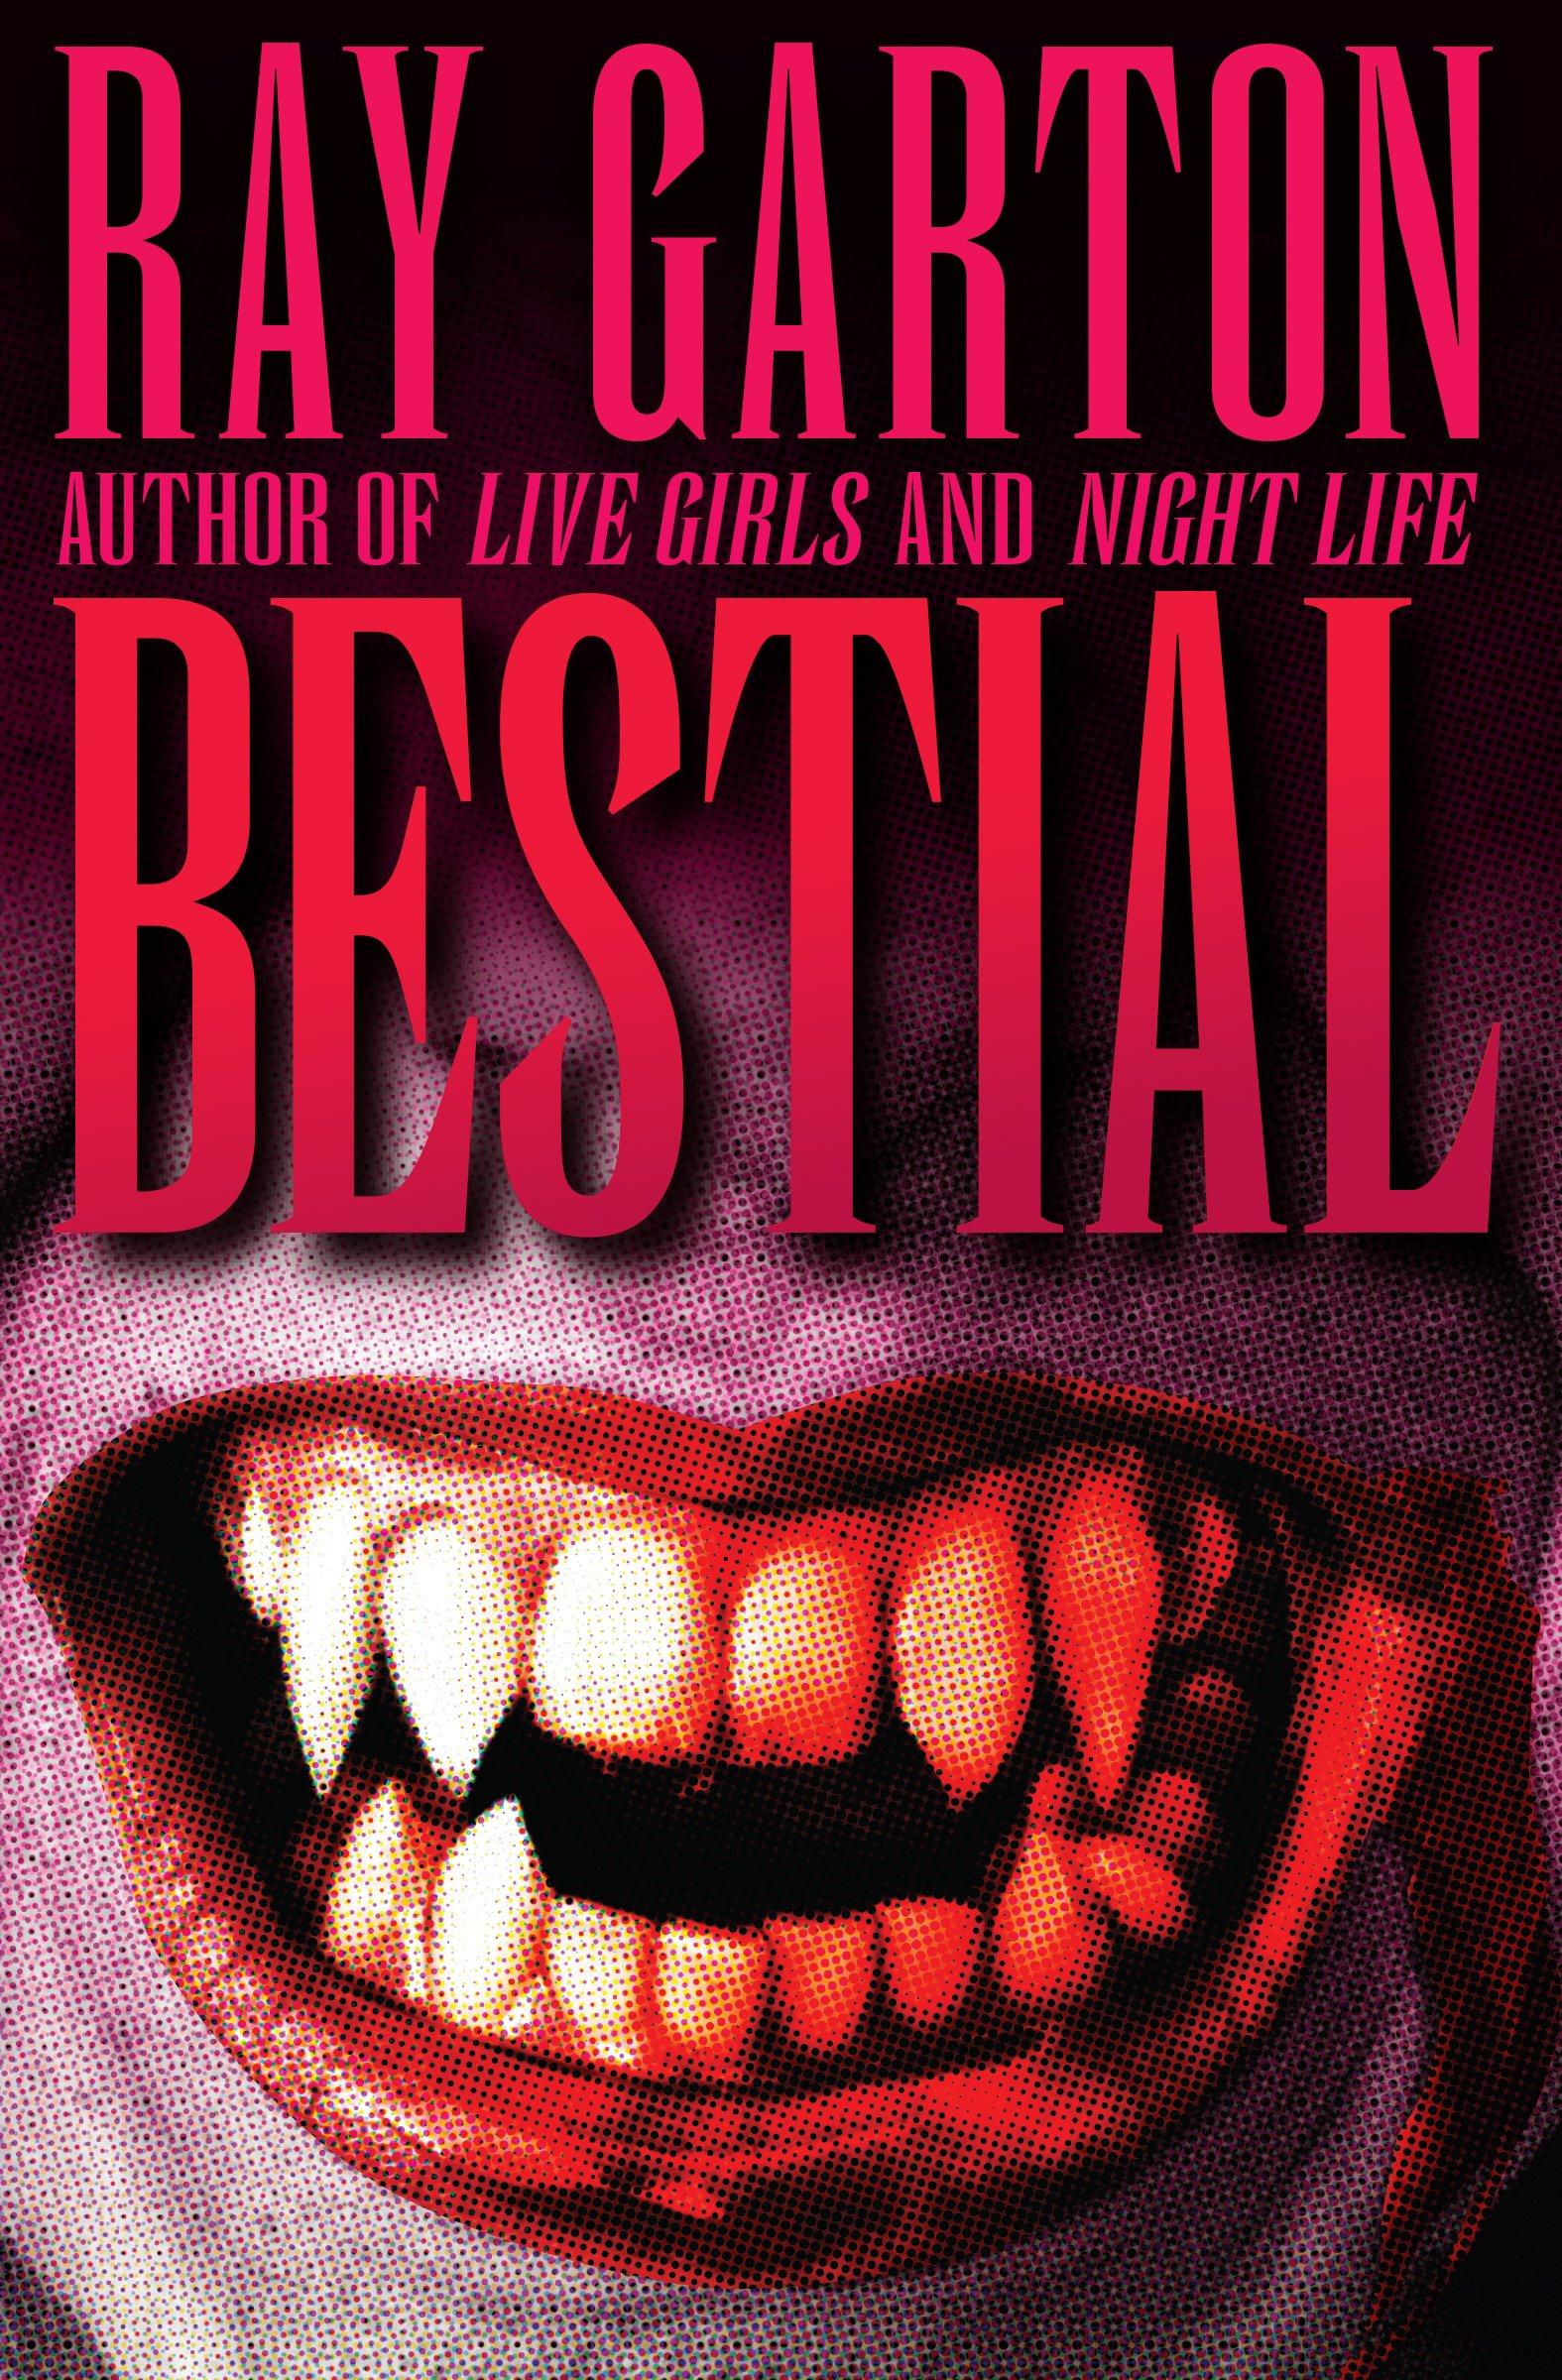 8747f68e8f72 Bestial  Amazon.co.uk  Ray Garton  9781497642577  Books